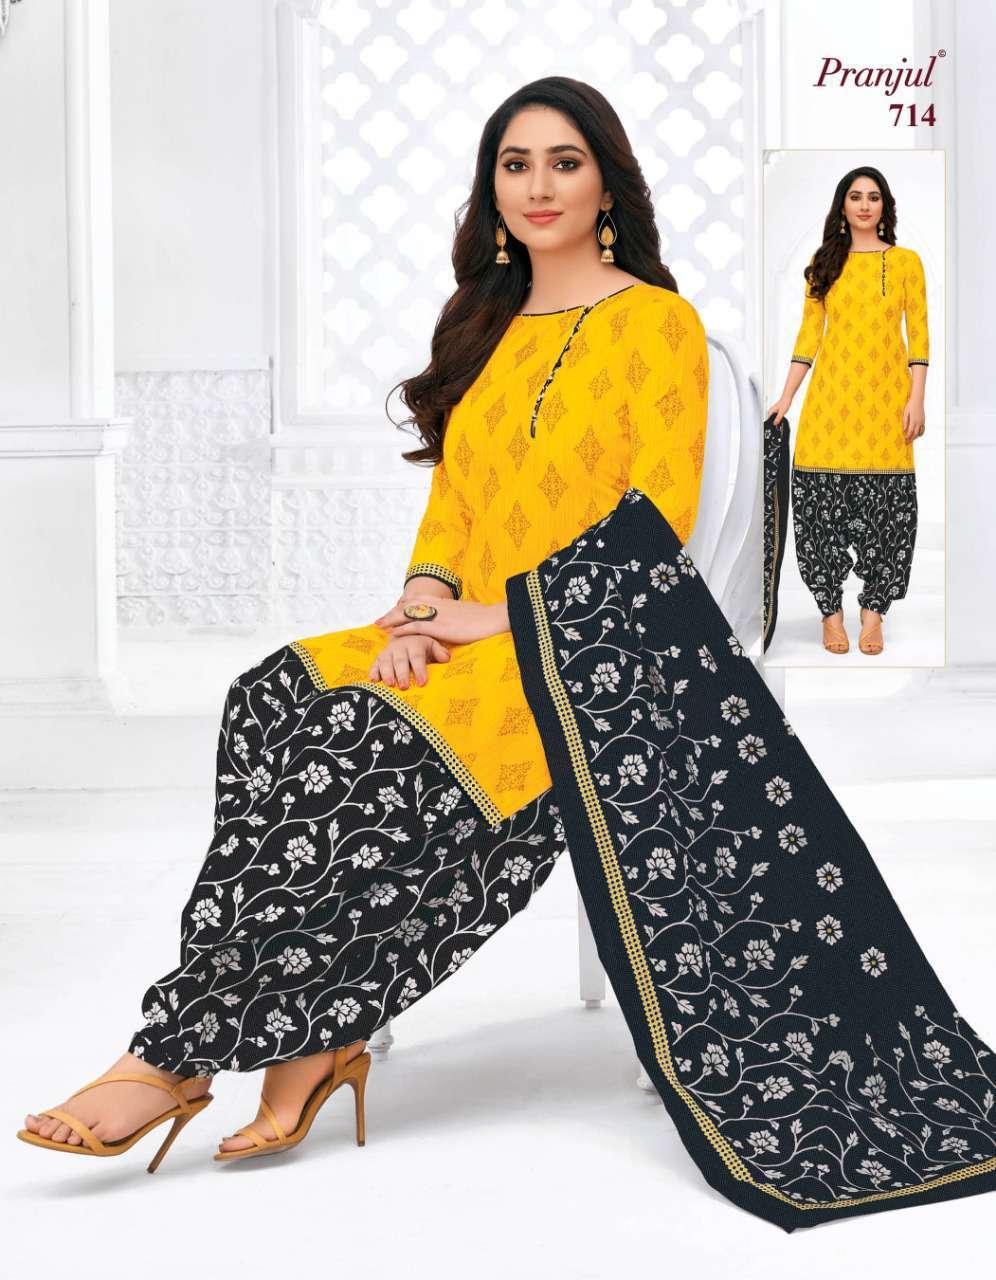 Pranjul Priyanka Vol 7 A Premium Collection Unstitched Suit Wholesale Catalog 18 Pcs 11 - Pranjul Priyanka Vol 7 A Unstitched Suit Wholesale Catalog 18 Pcs